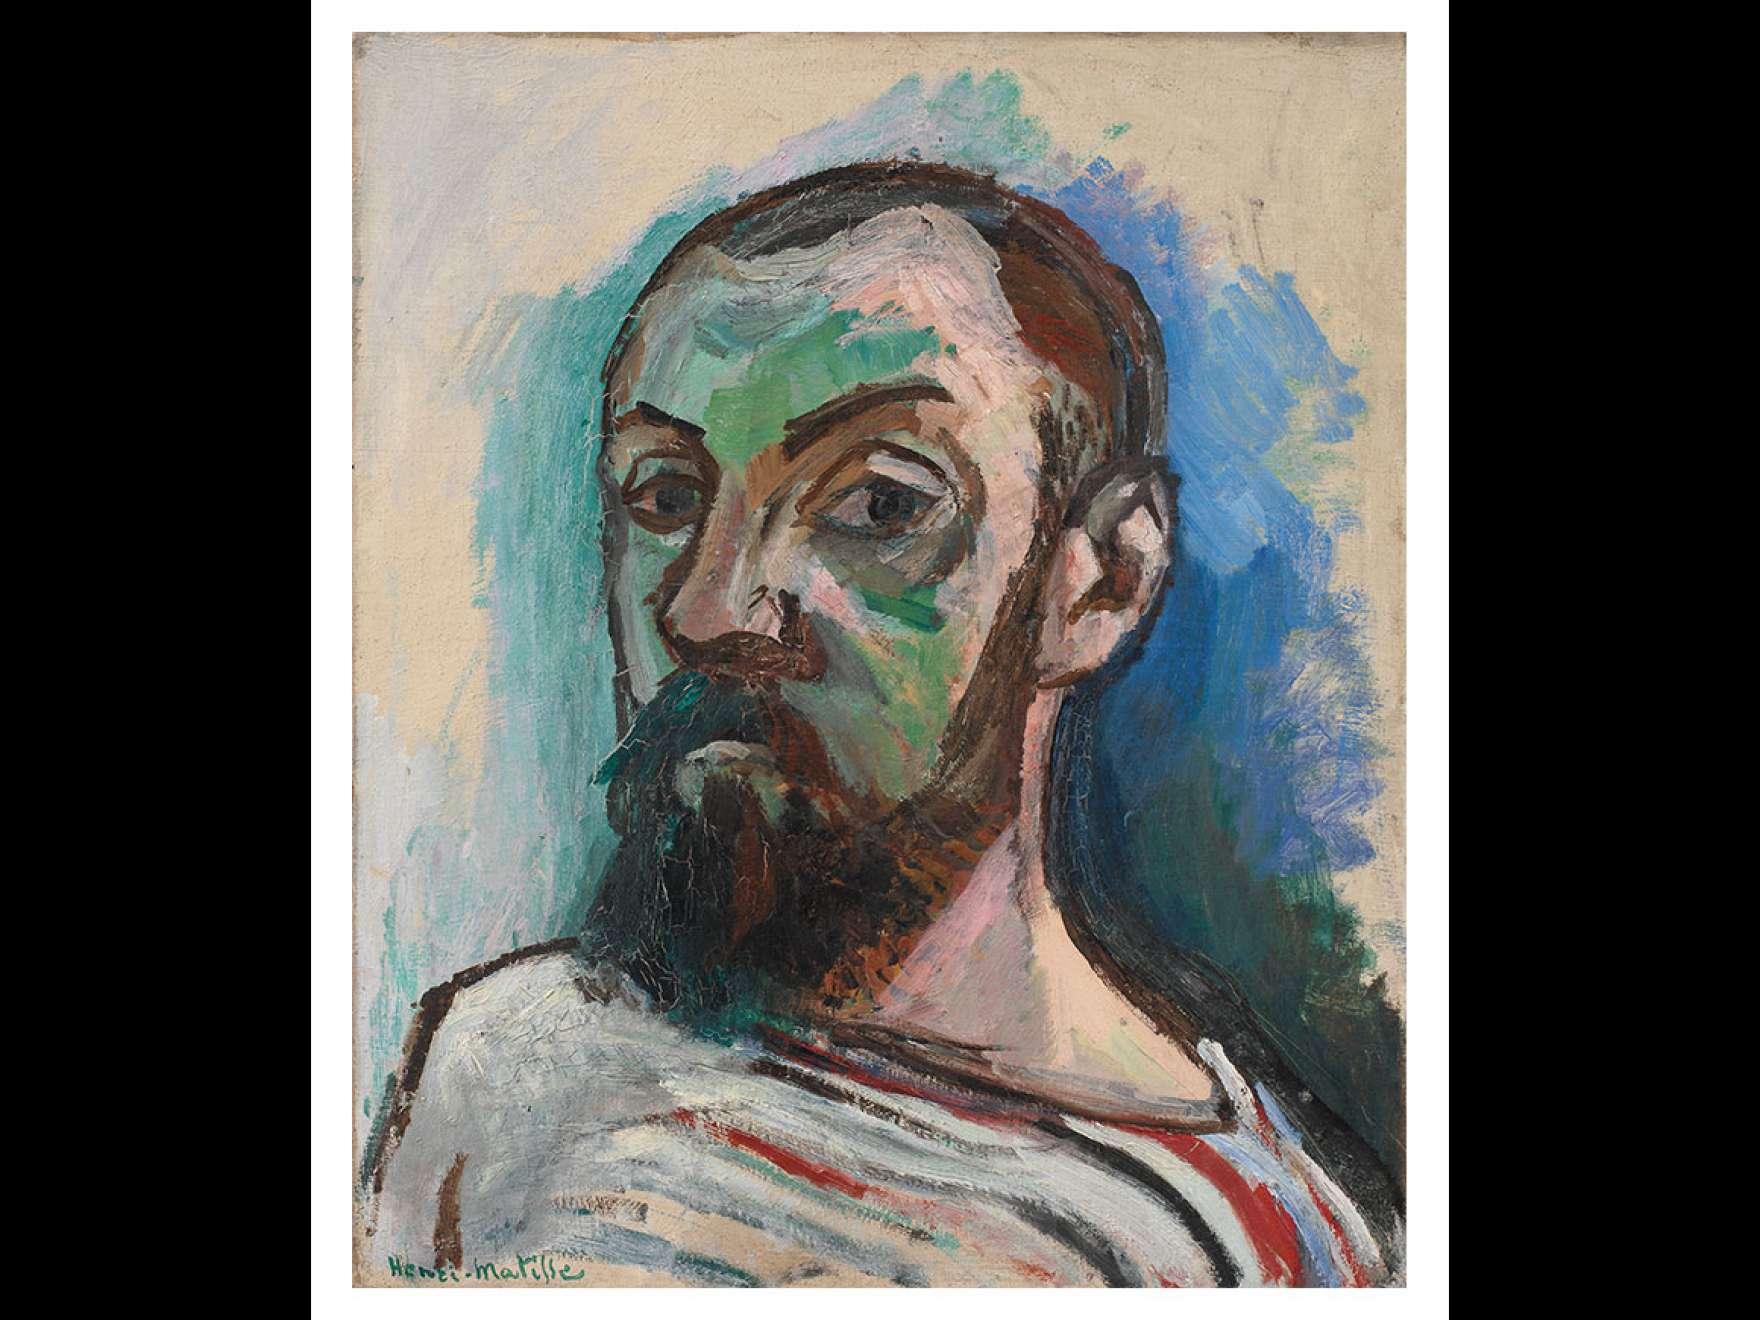 Henri Matisse's painting, Self-Portrait